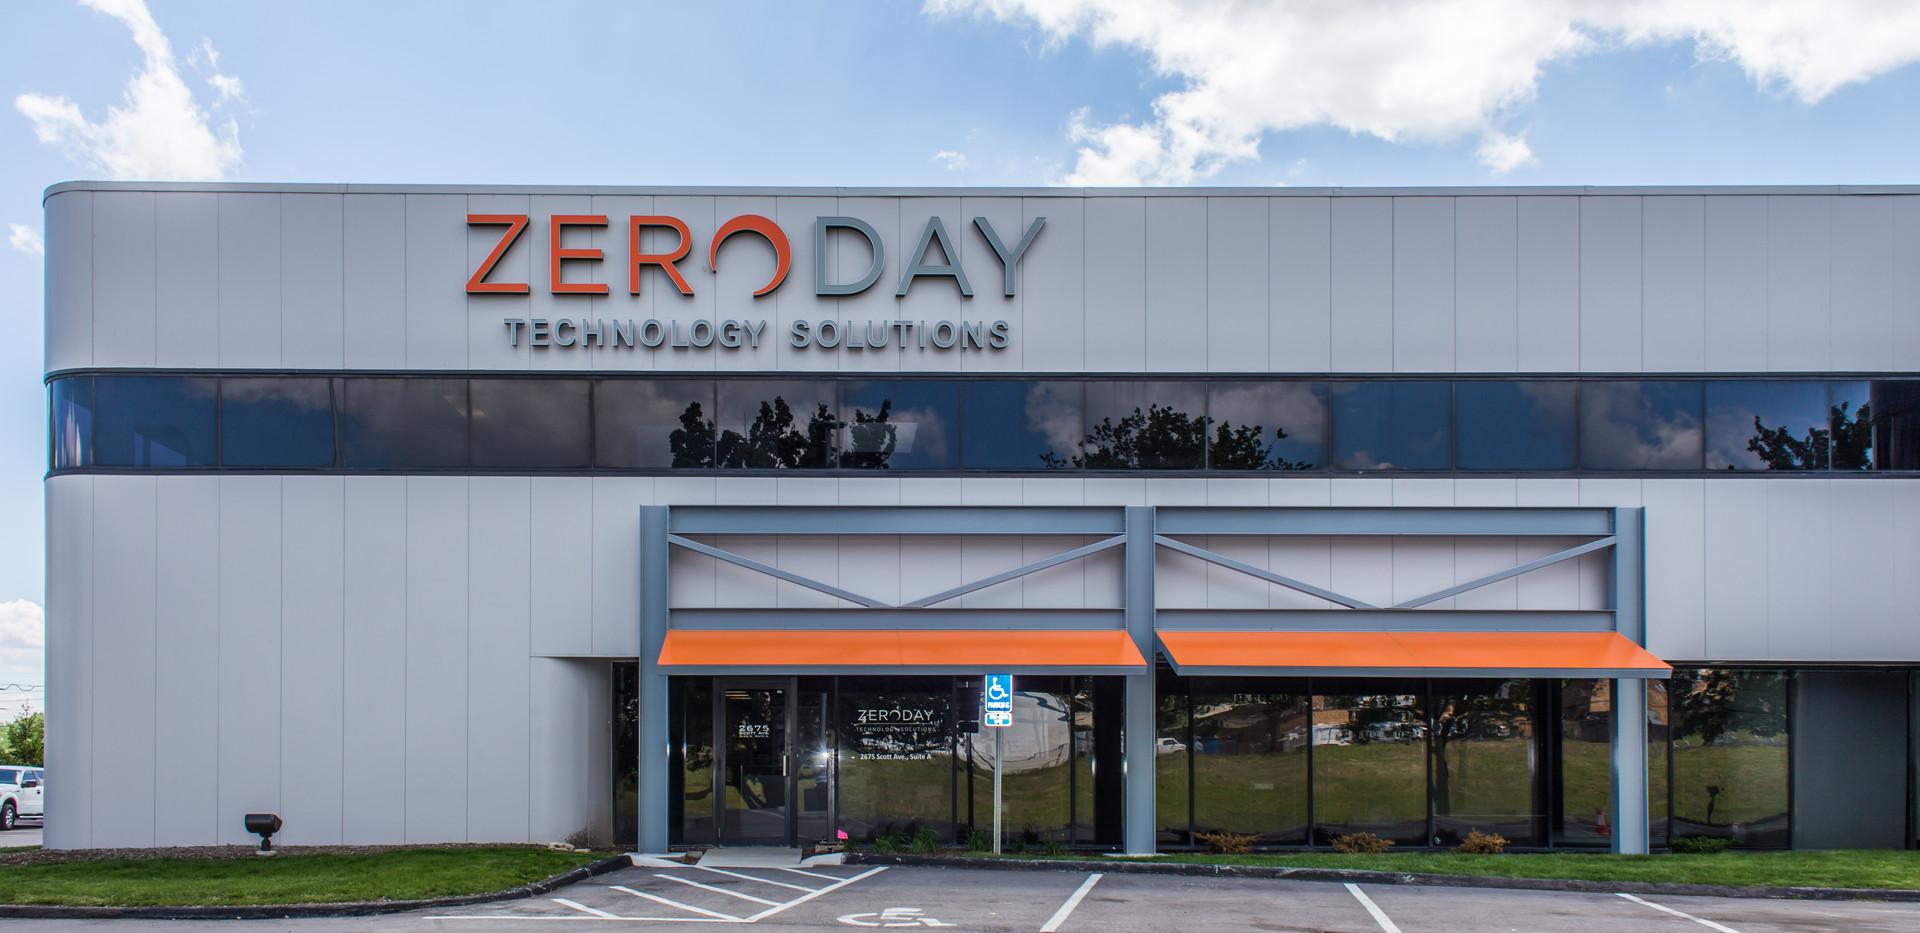 ZeroDay Building Exterior.jpg